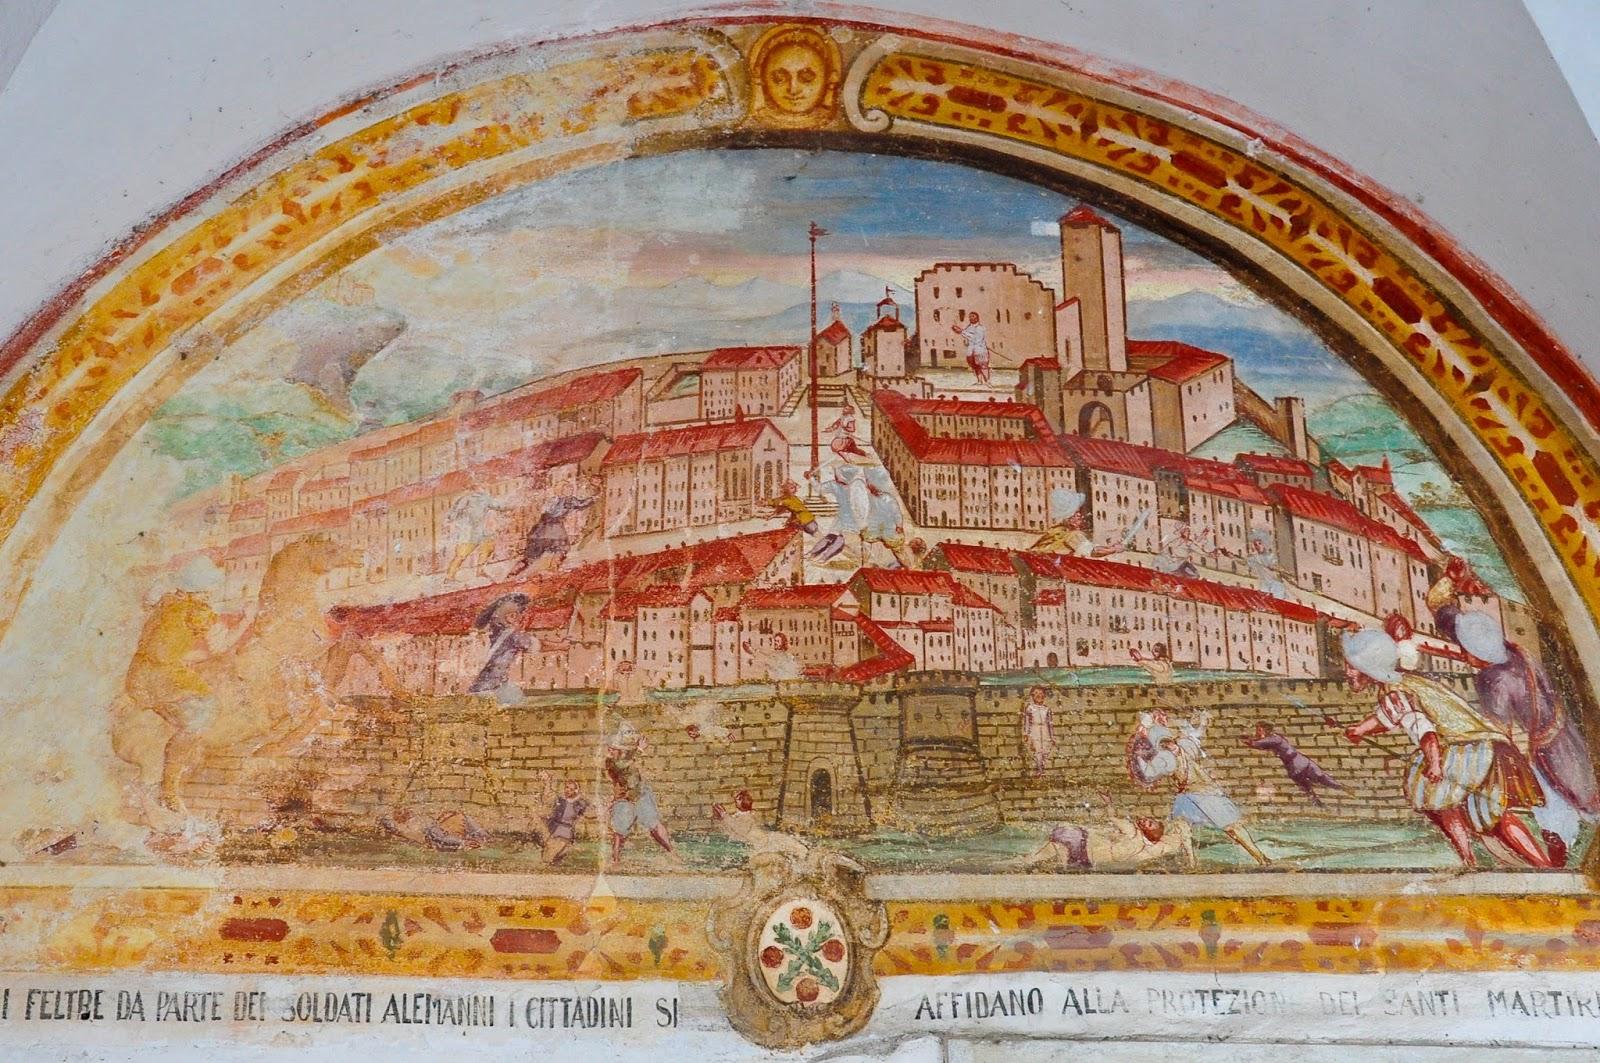 Frescoes, Cloister, Sanctuary of St. St. Vittore e Corona, Feltre, Veneto, Italy